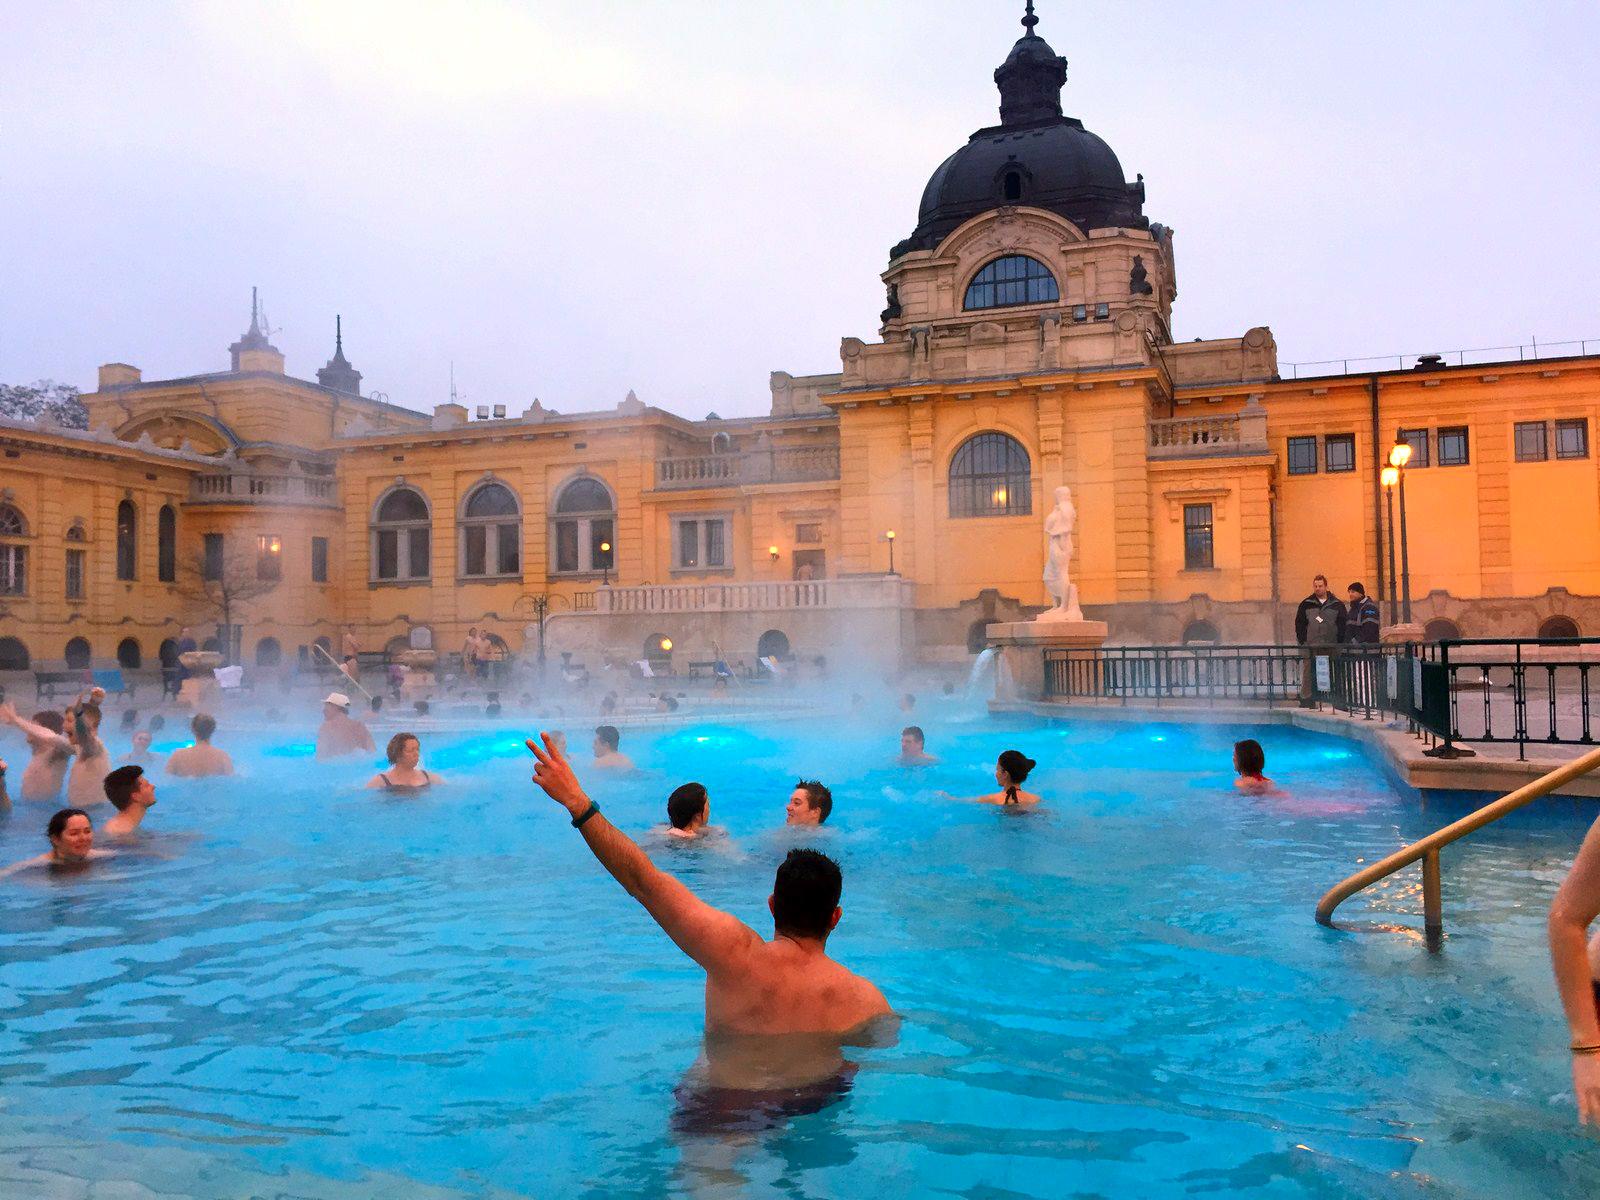 Qué ver en Budapest en un fin de semana: Baños Szechenyi en Budapest budapest en un fin de semana - 21235467719 77e3d18f40 o - Qué ver en Budapest en un fin de semana